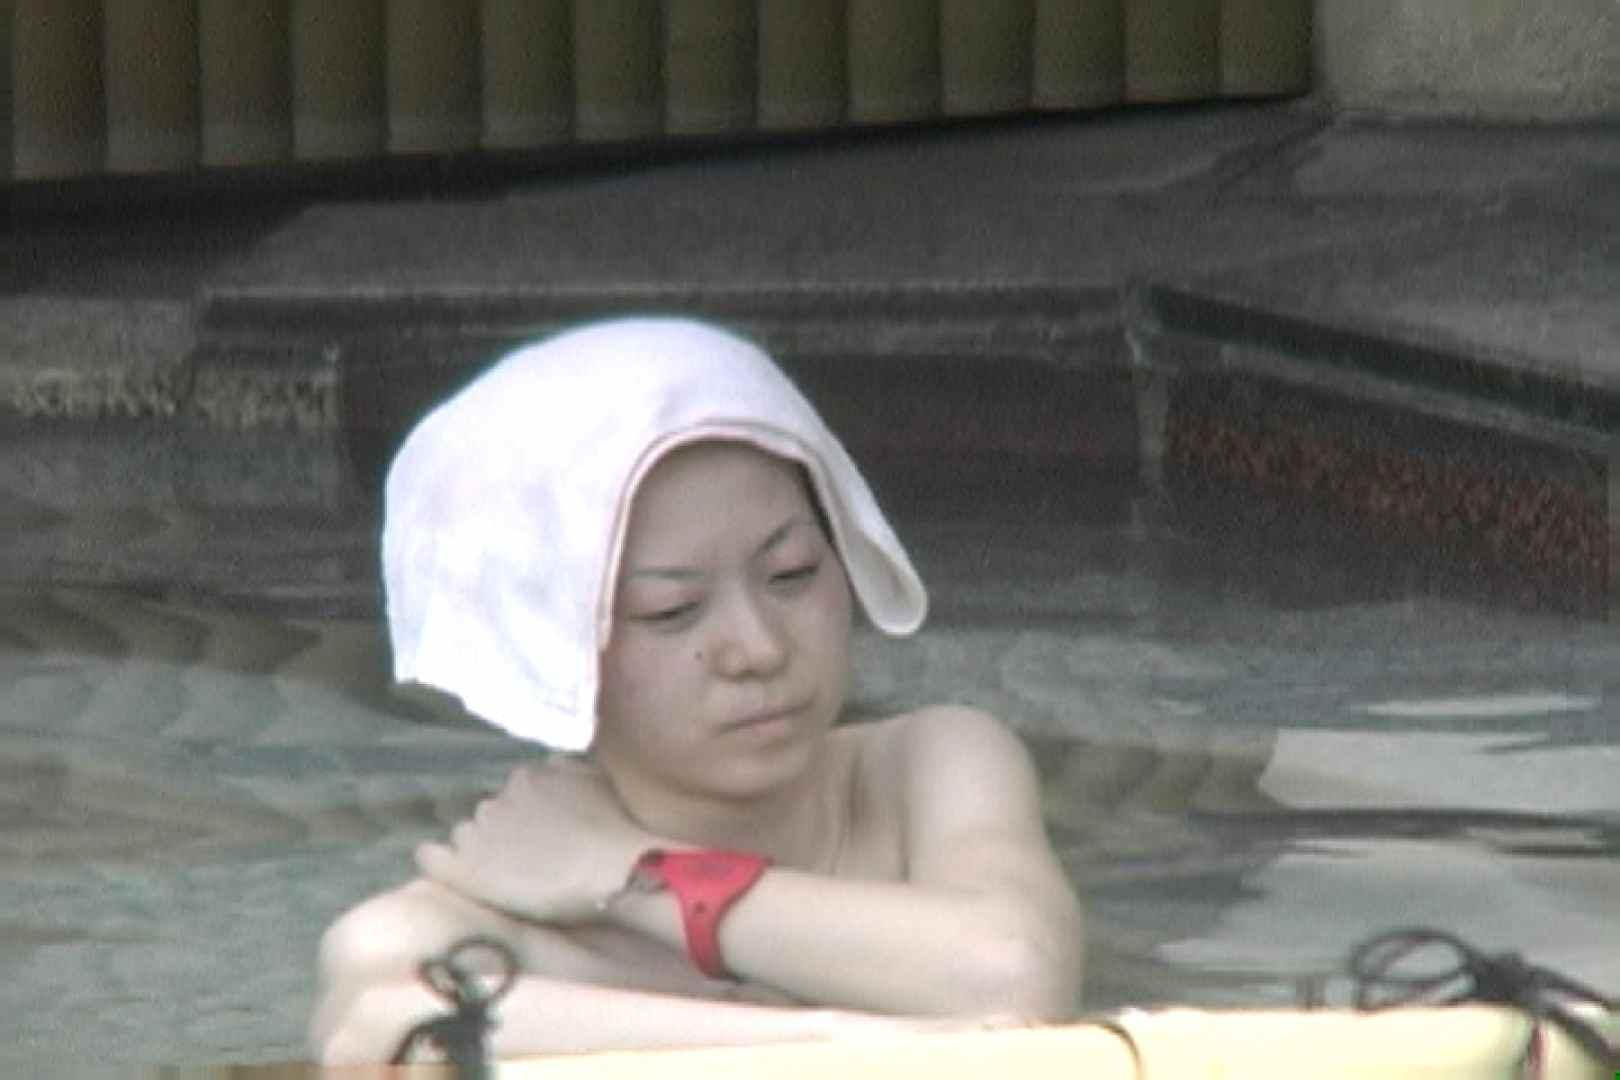 Aquaな露天風呂Vol.693 露天風呂編  105PIX 10